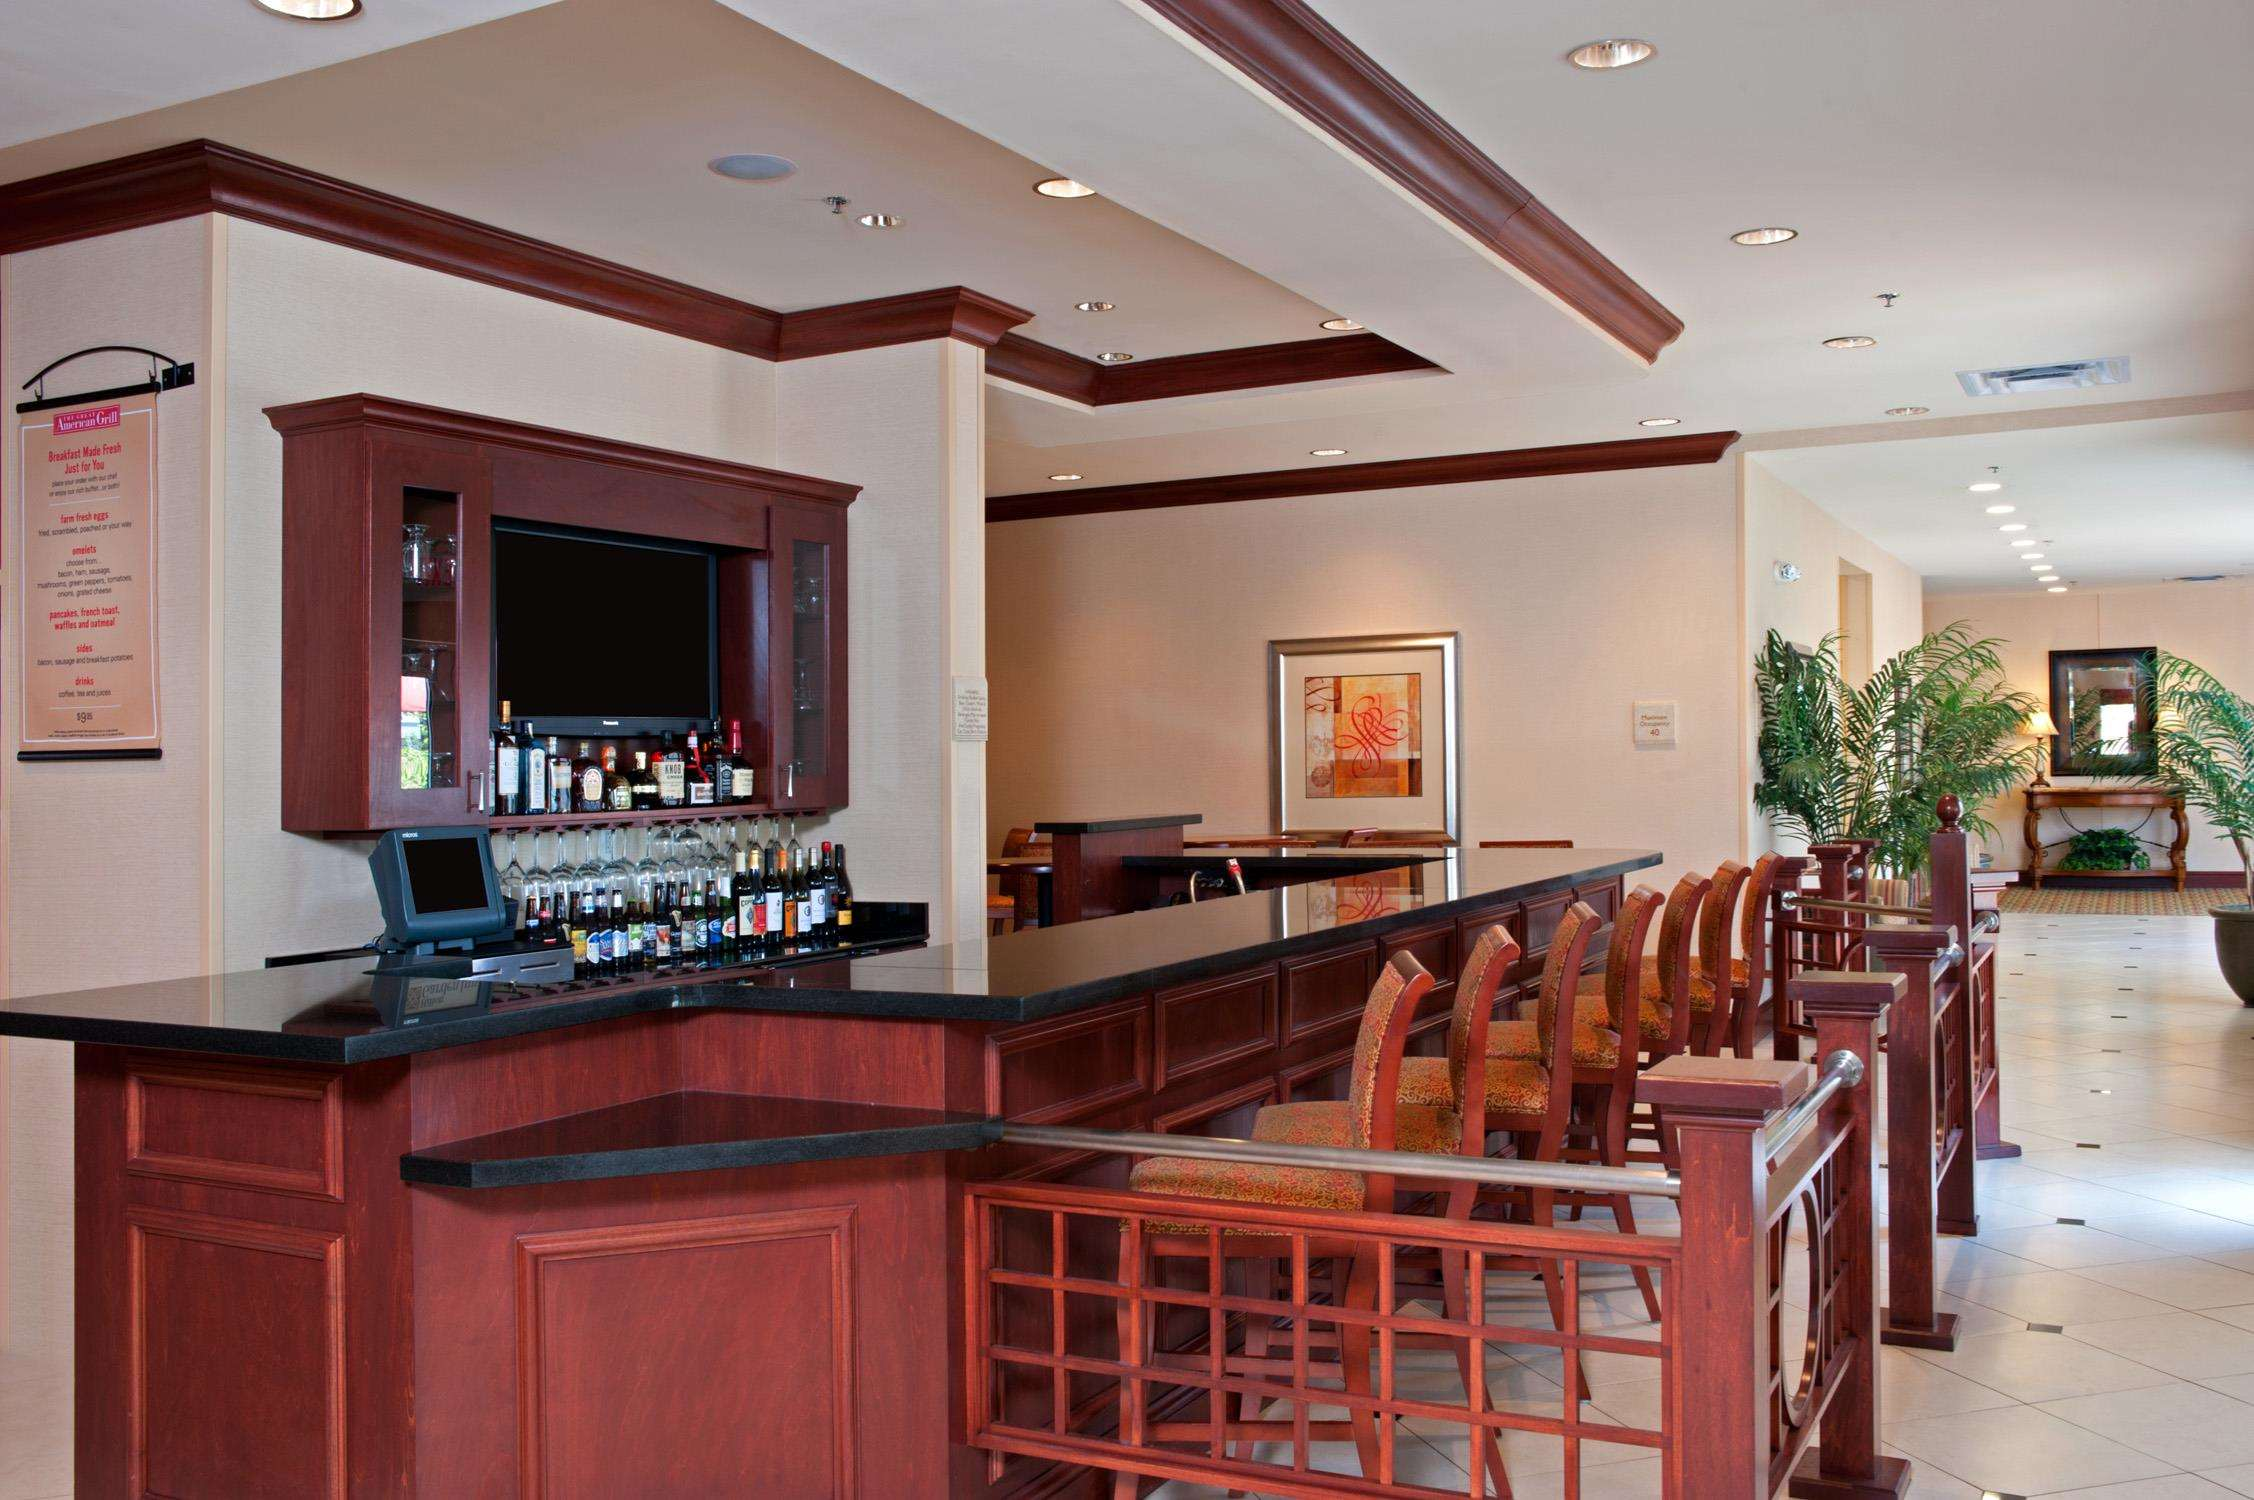 Hilton Garden Inn Indianapolis Airport image 33